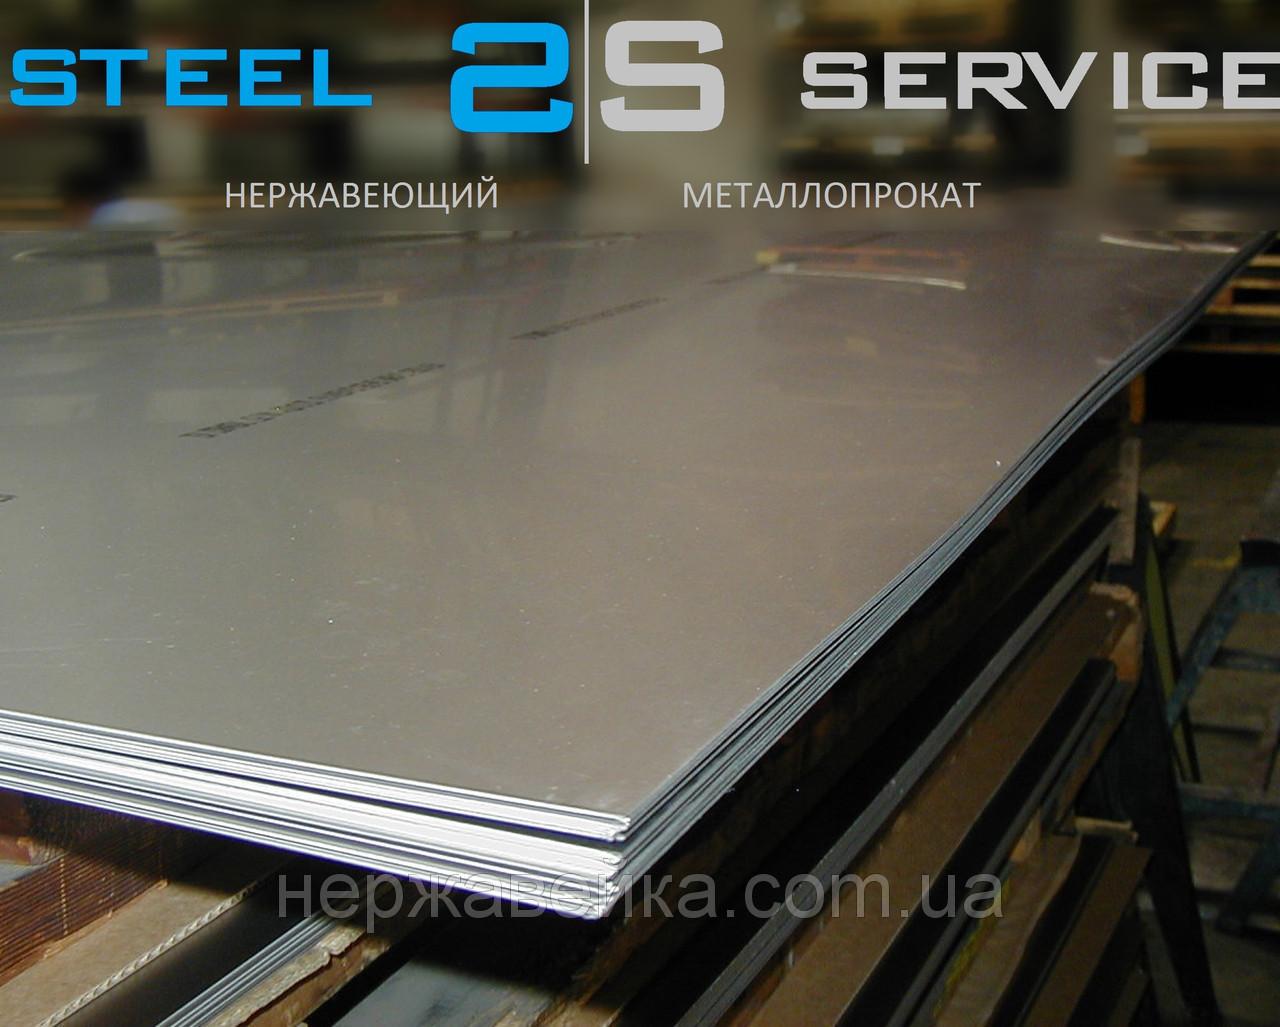 Нержавейка лист 0,8х1250х2000мм  AISI 316Ti(10Х17Н13М2Т) BA - зеркало,  кислотостойкий